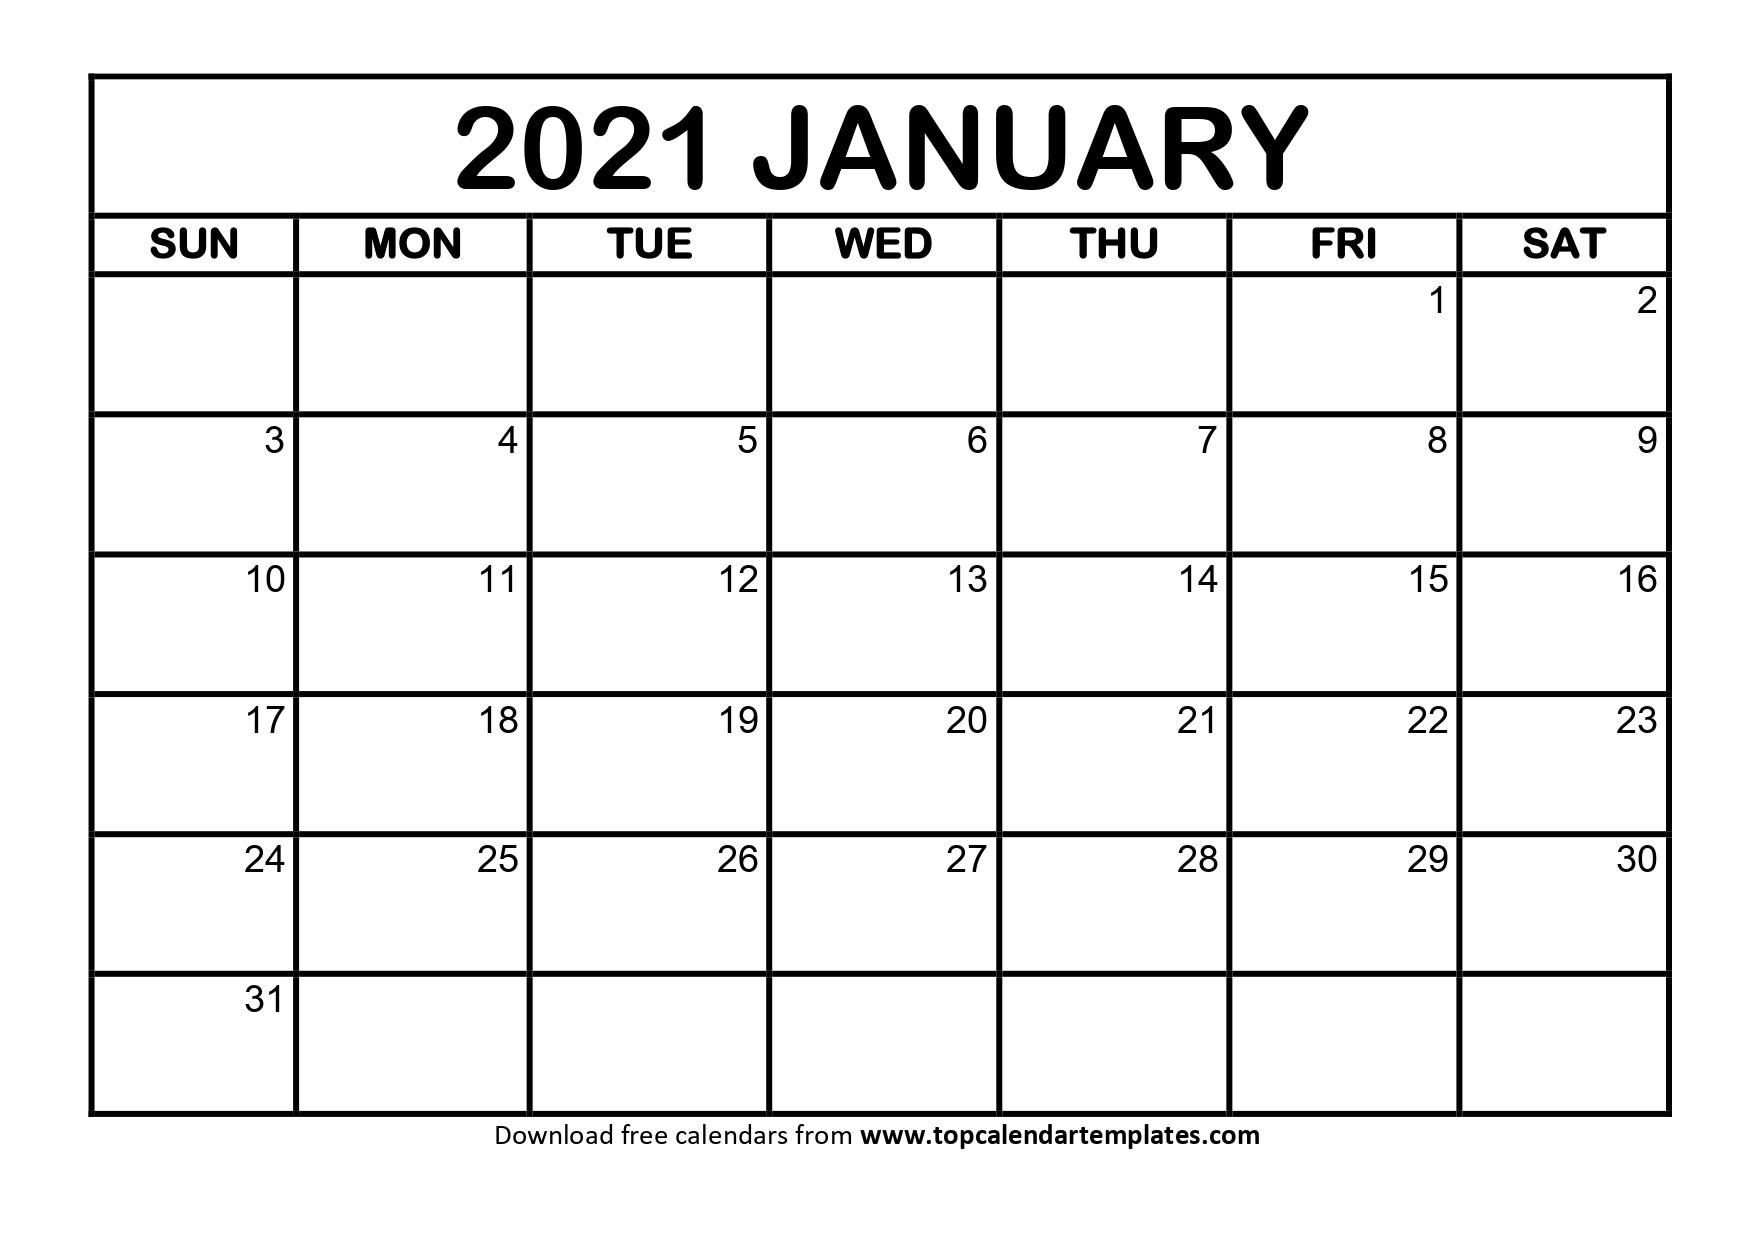 January 2021 Printable Calendar - Editable Templates